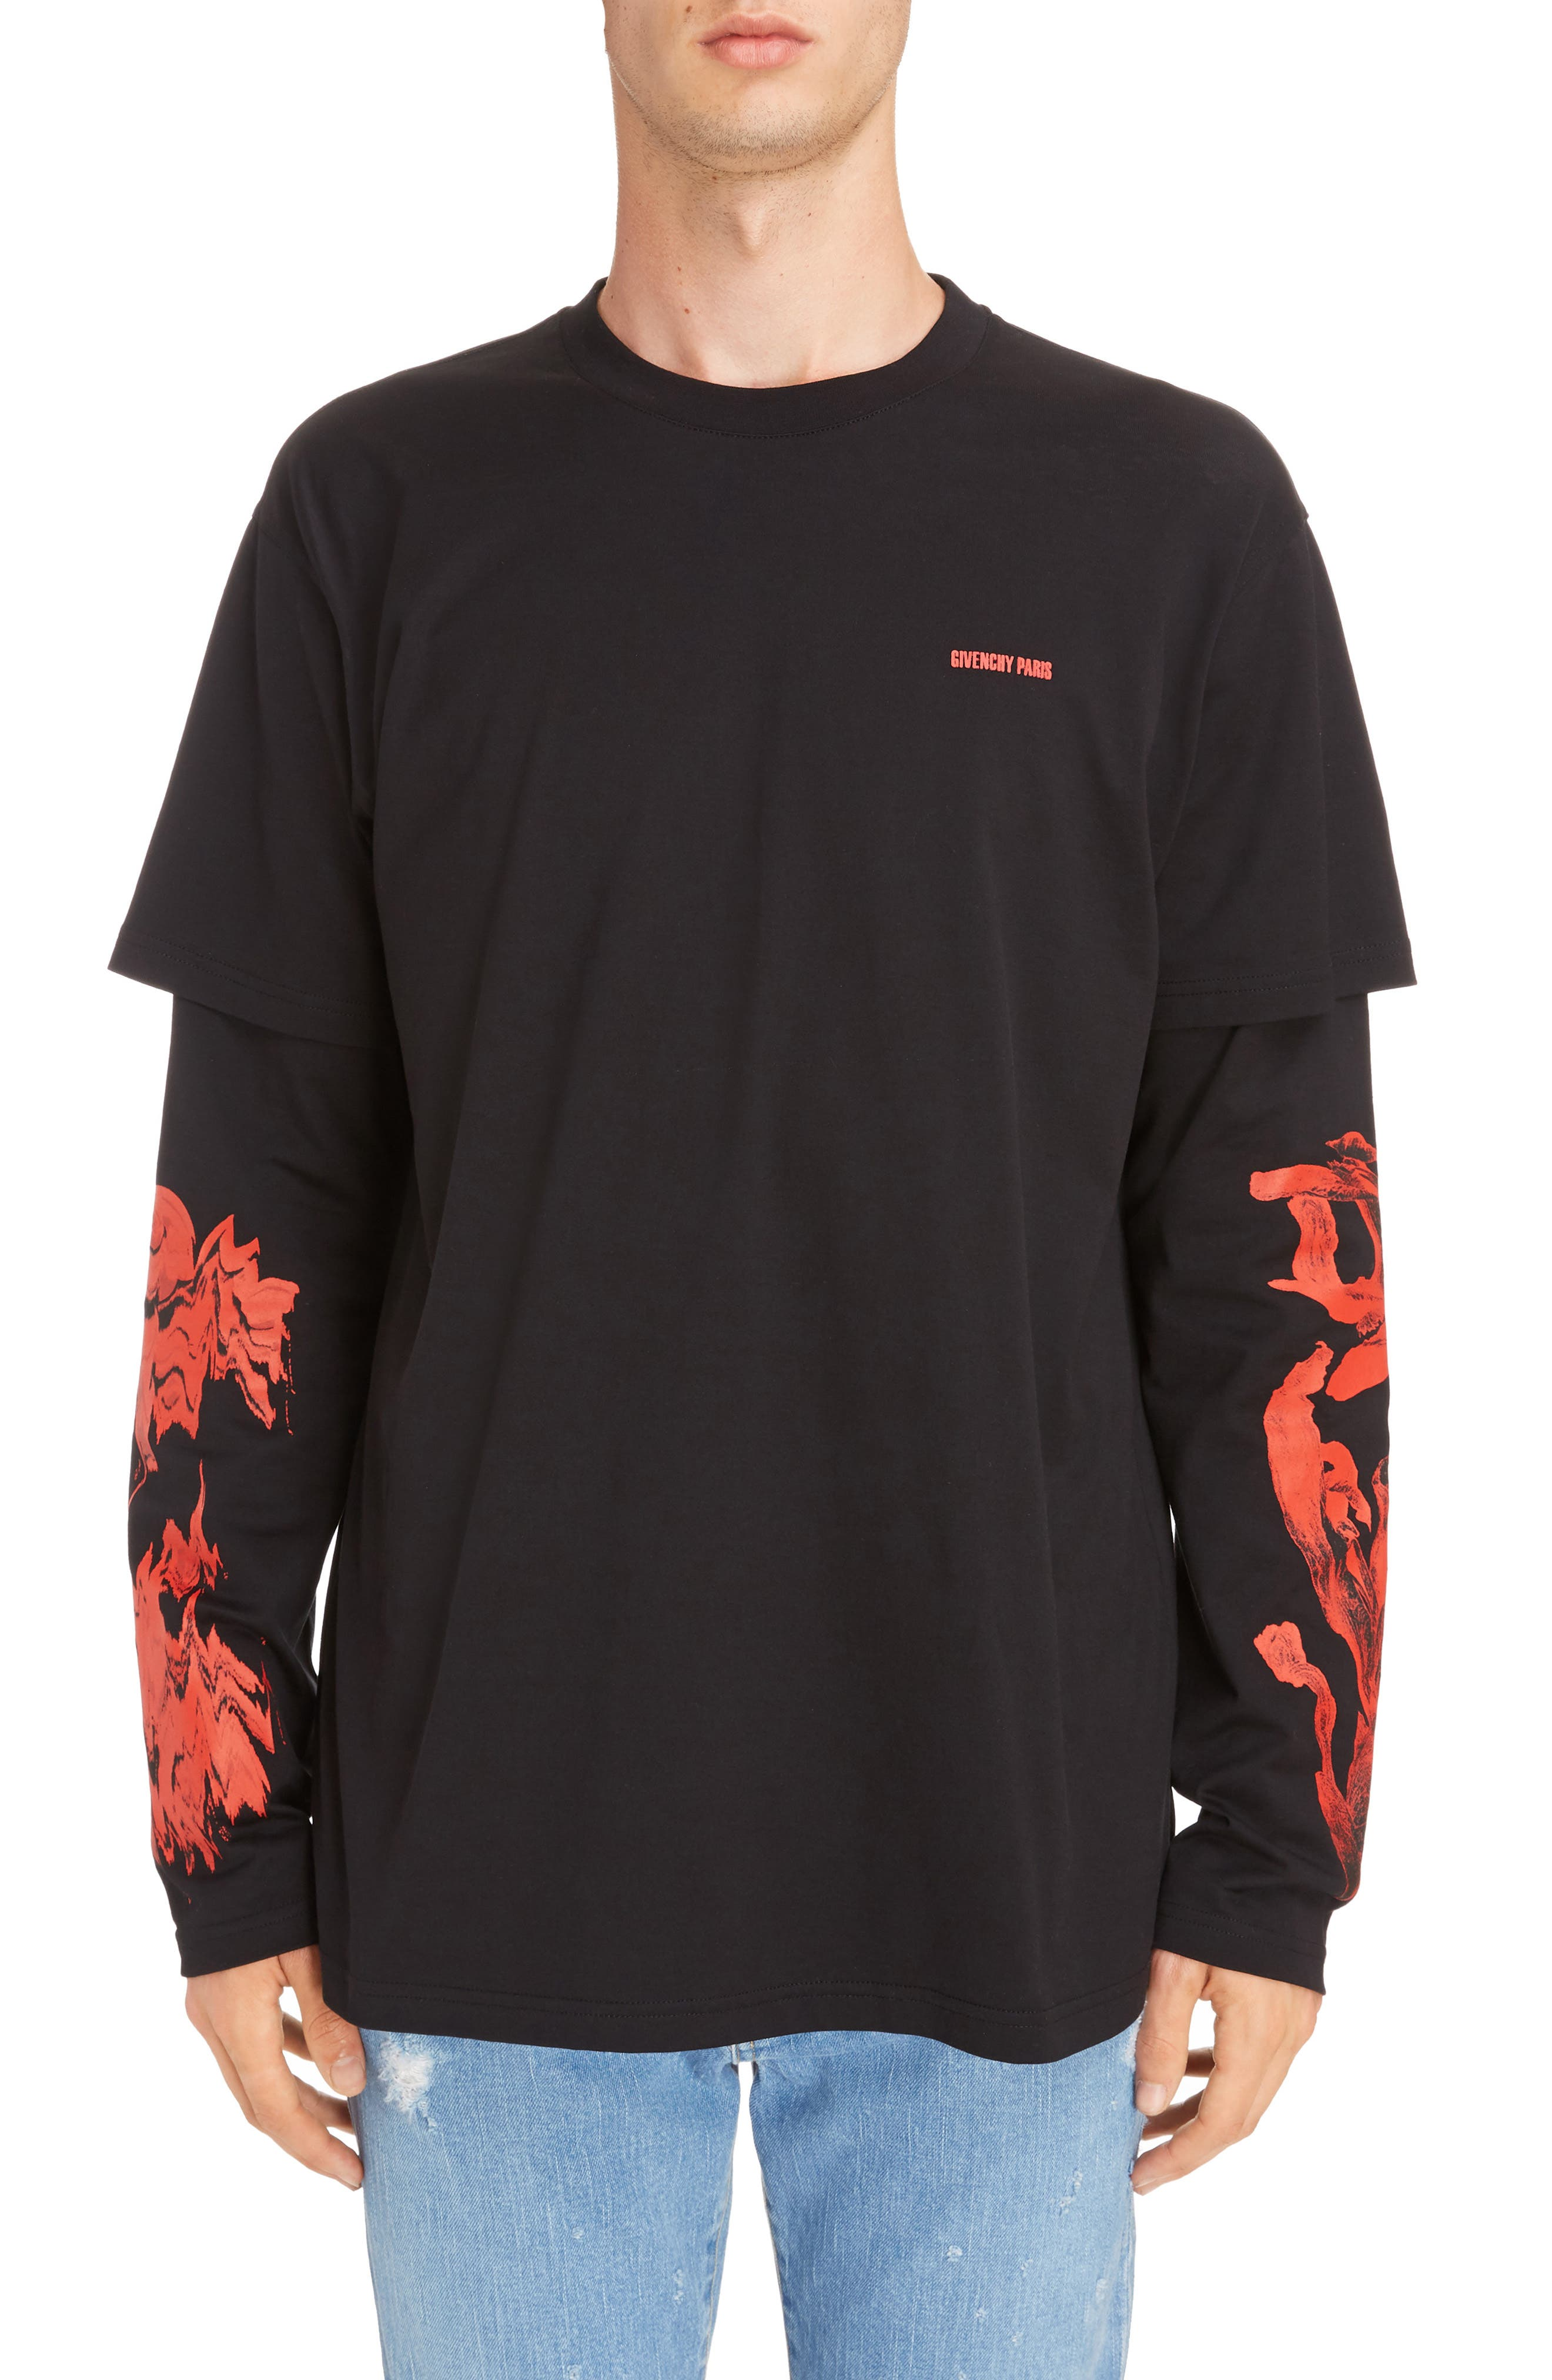 Givenchy Rose Print Long Sleeve T-Shirt